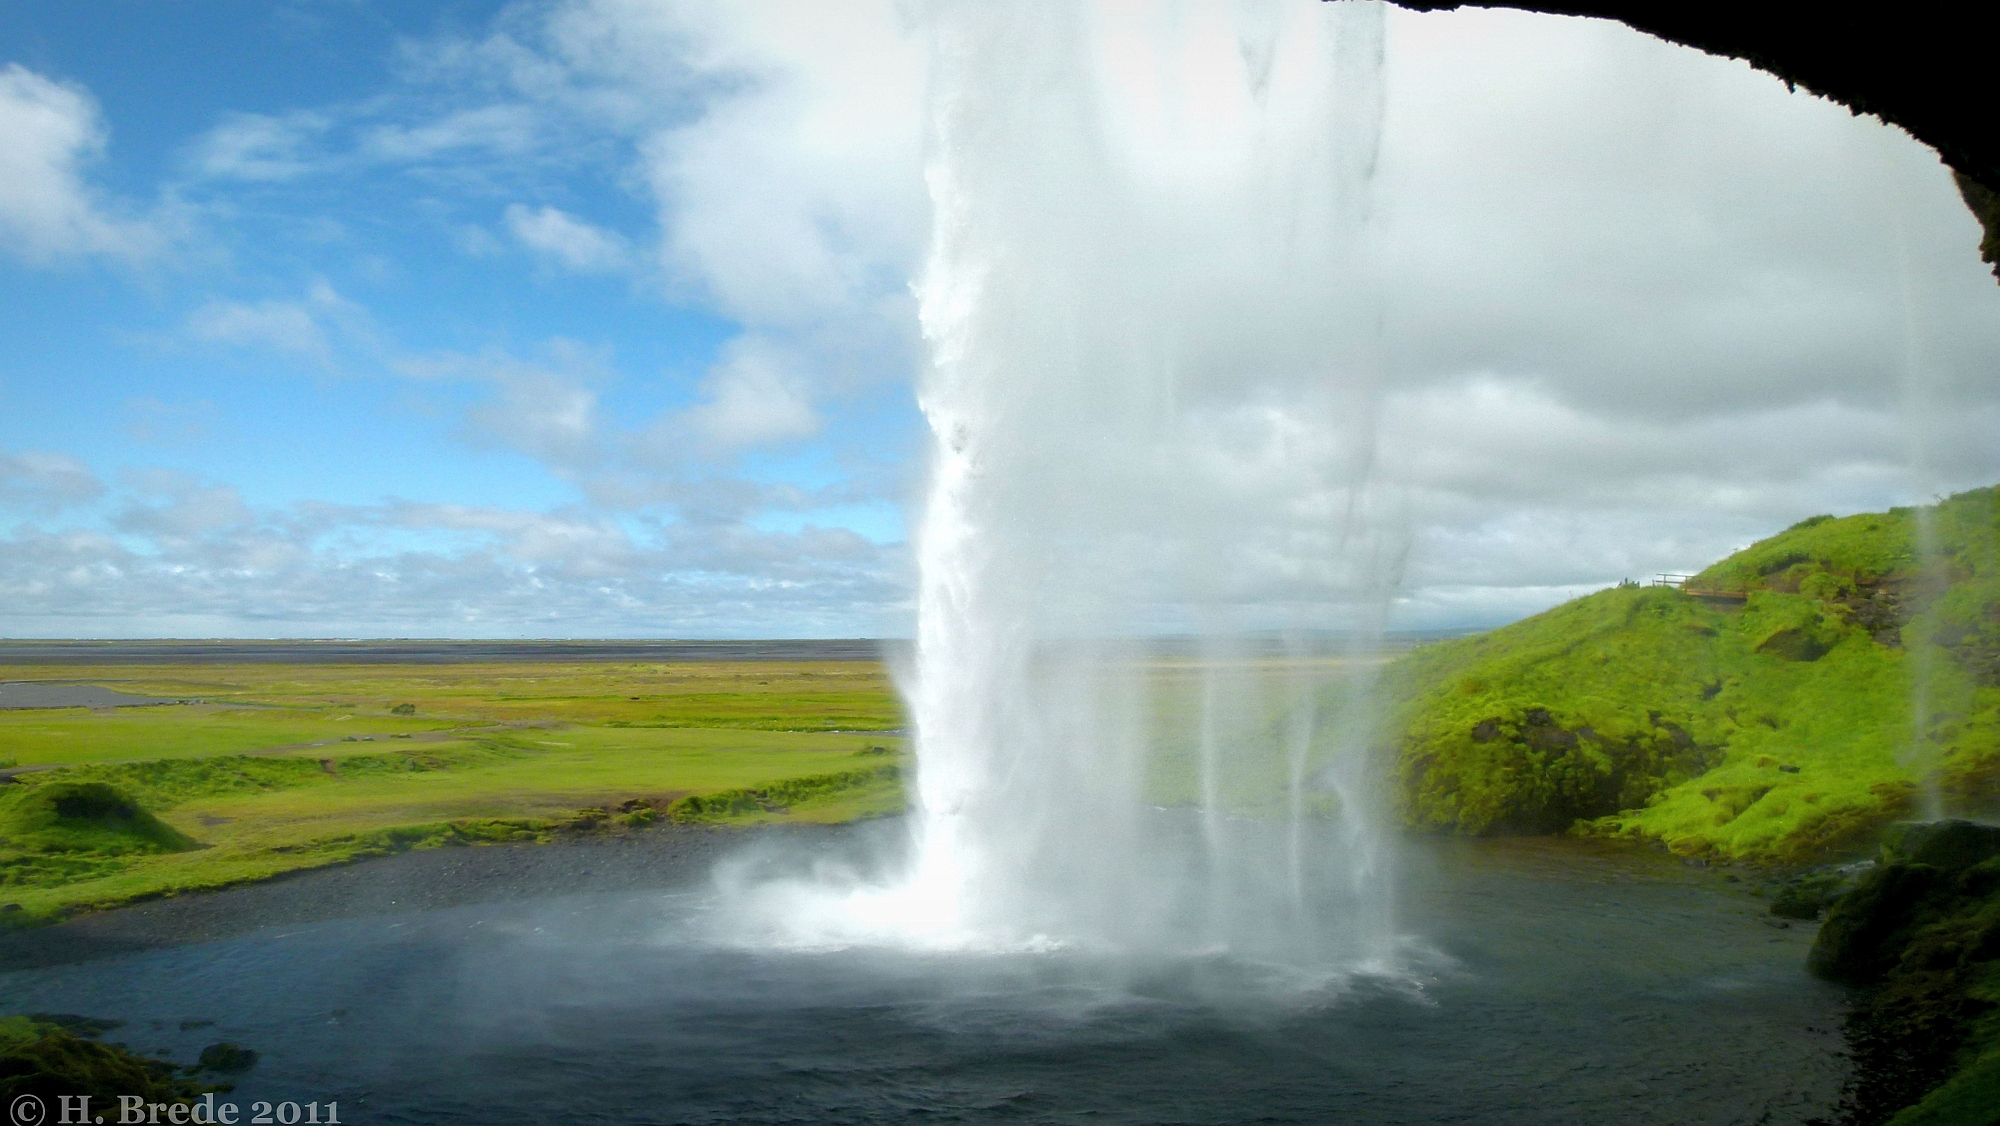 Behind the Seljalandsfoss, Iceland